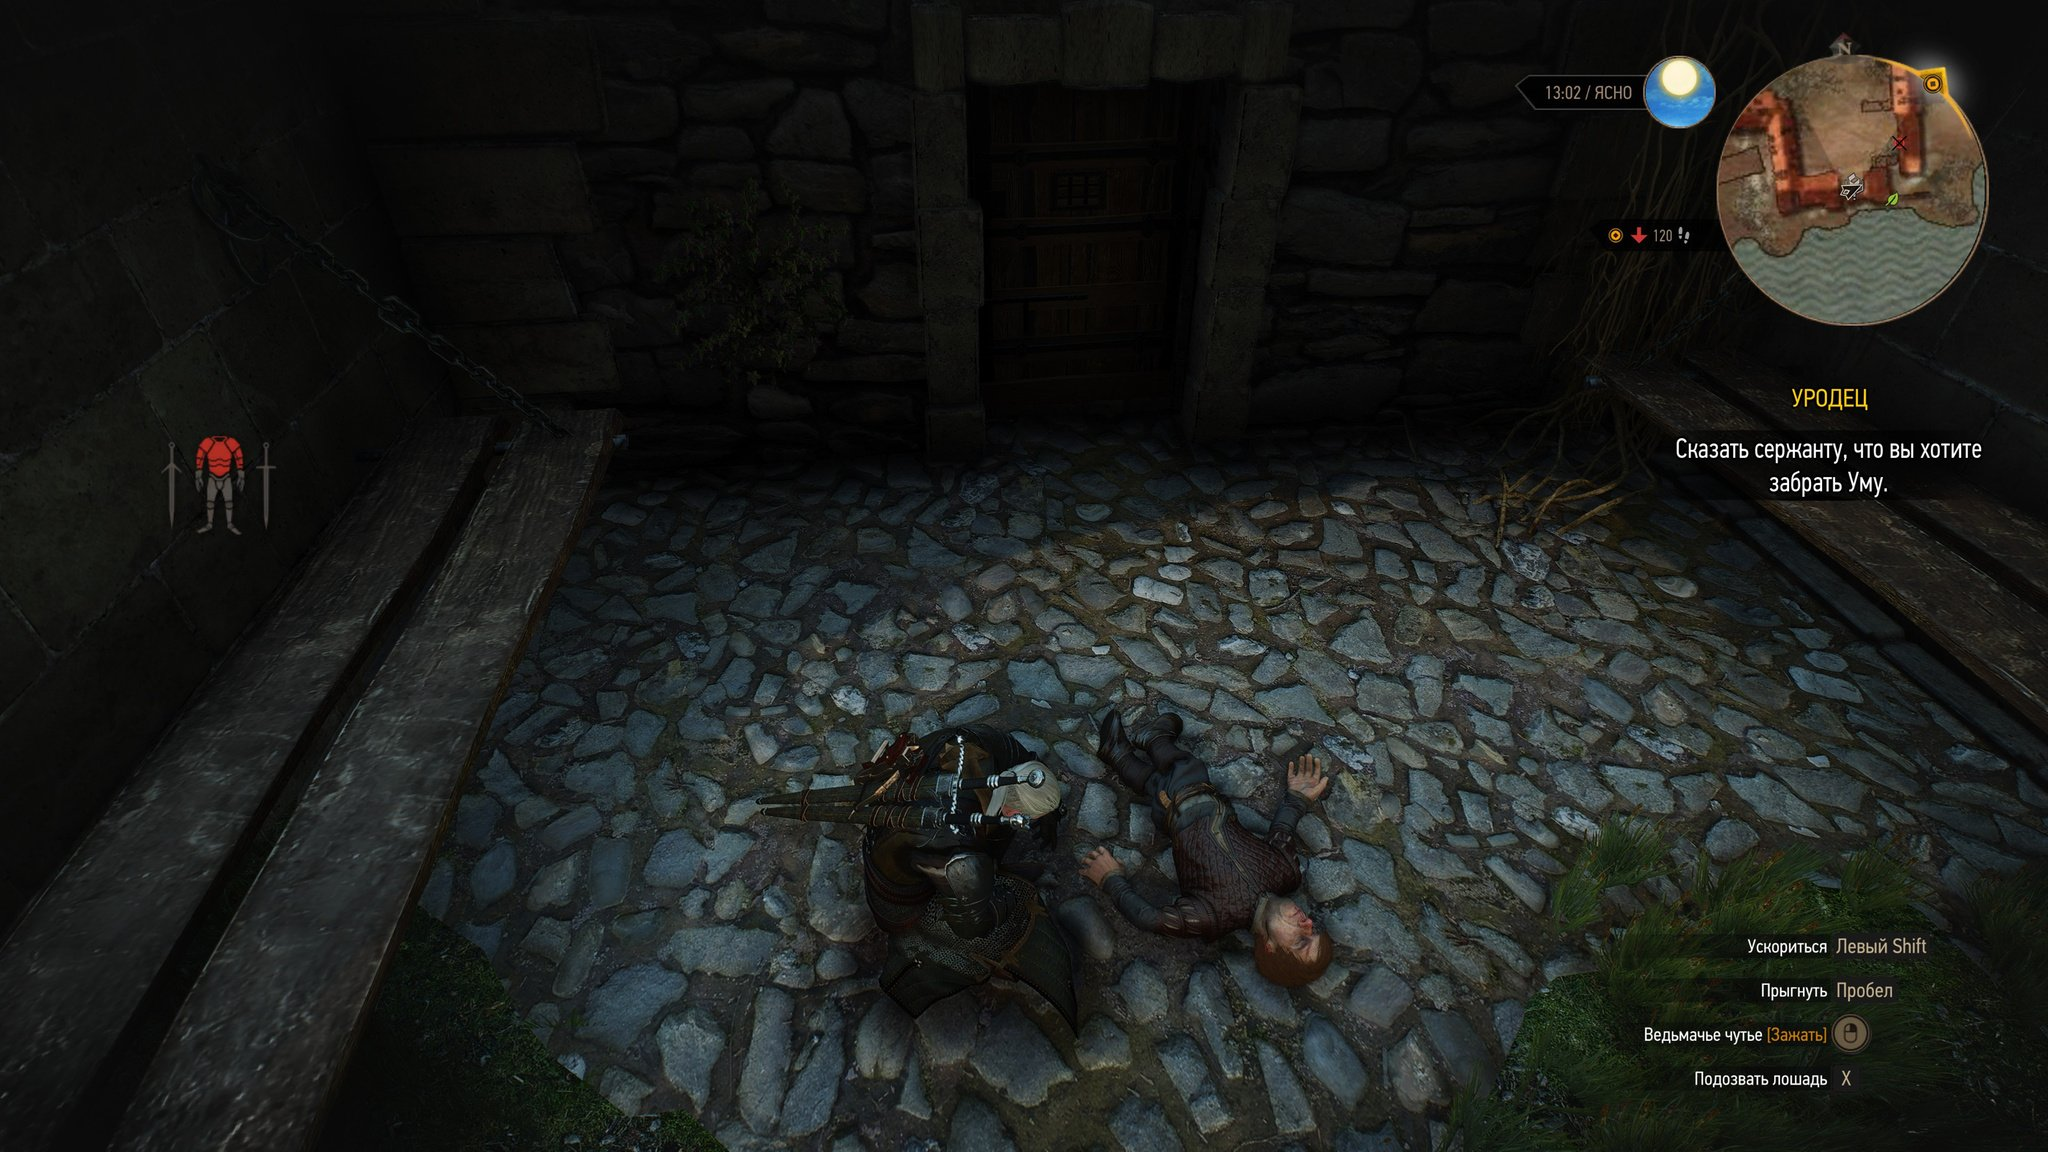 The Witcher 3: Wild Hunt Тирион Ланнистер - Изображение 1